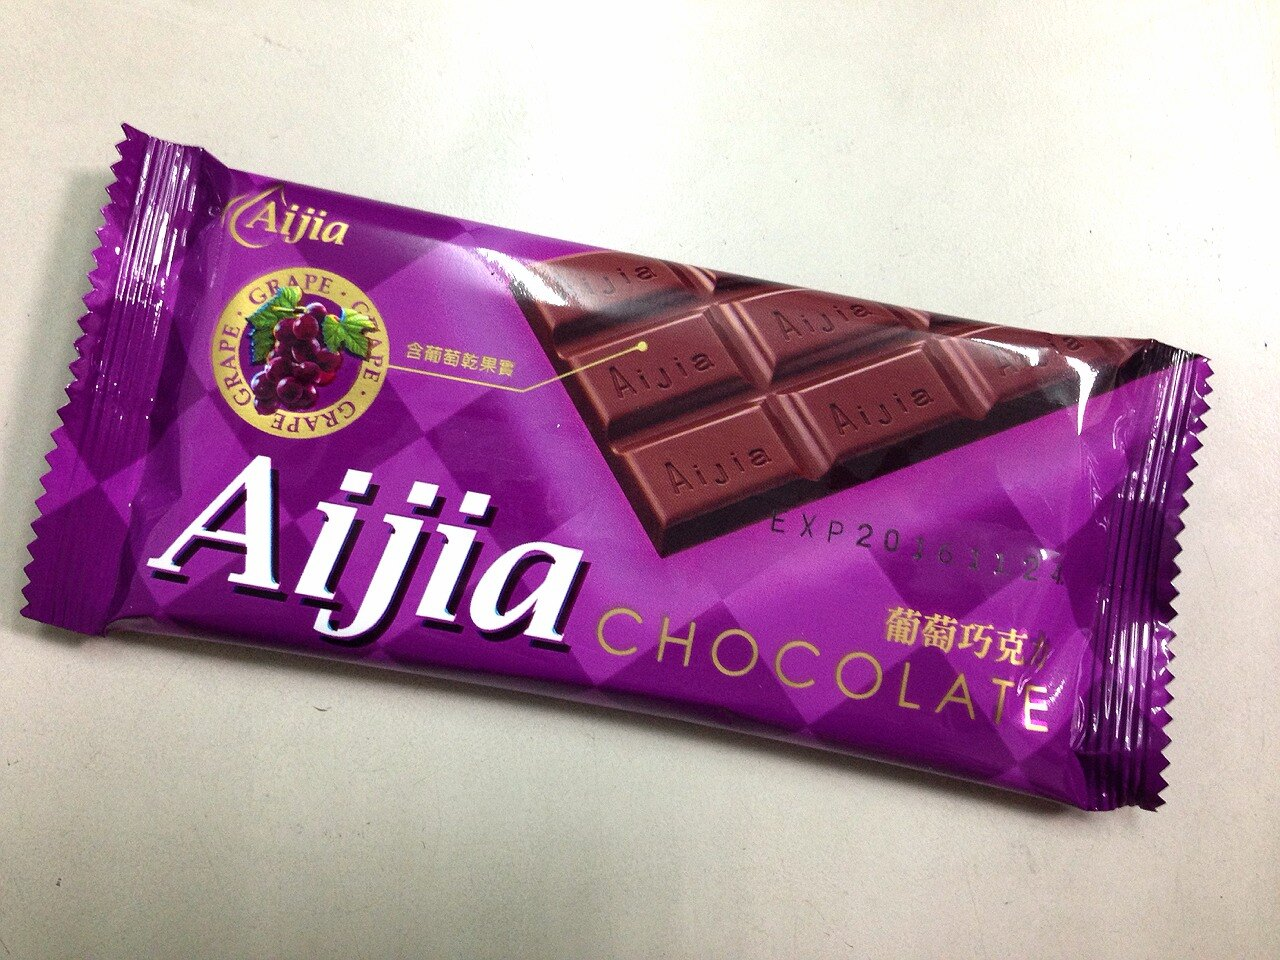 Aijia愛加葡萄巧克力35g限量版(20片/盒)●買一送一(共2盒)【合迷雅好物商城】